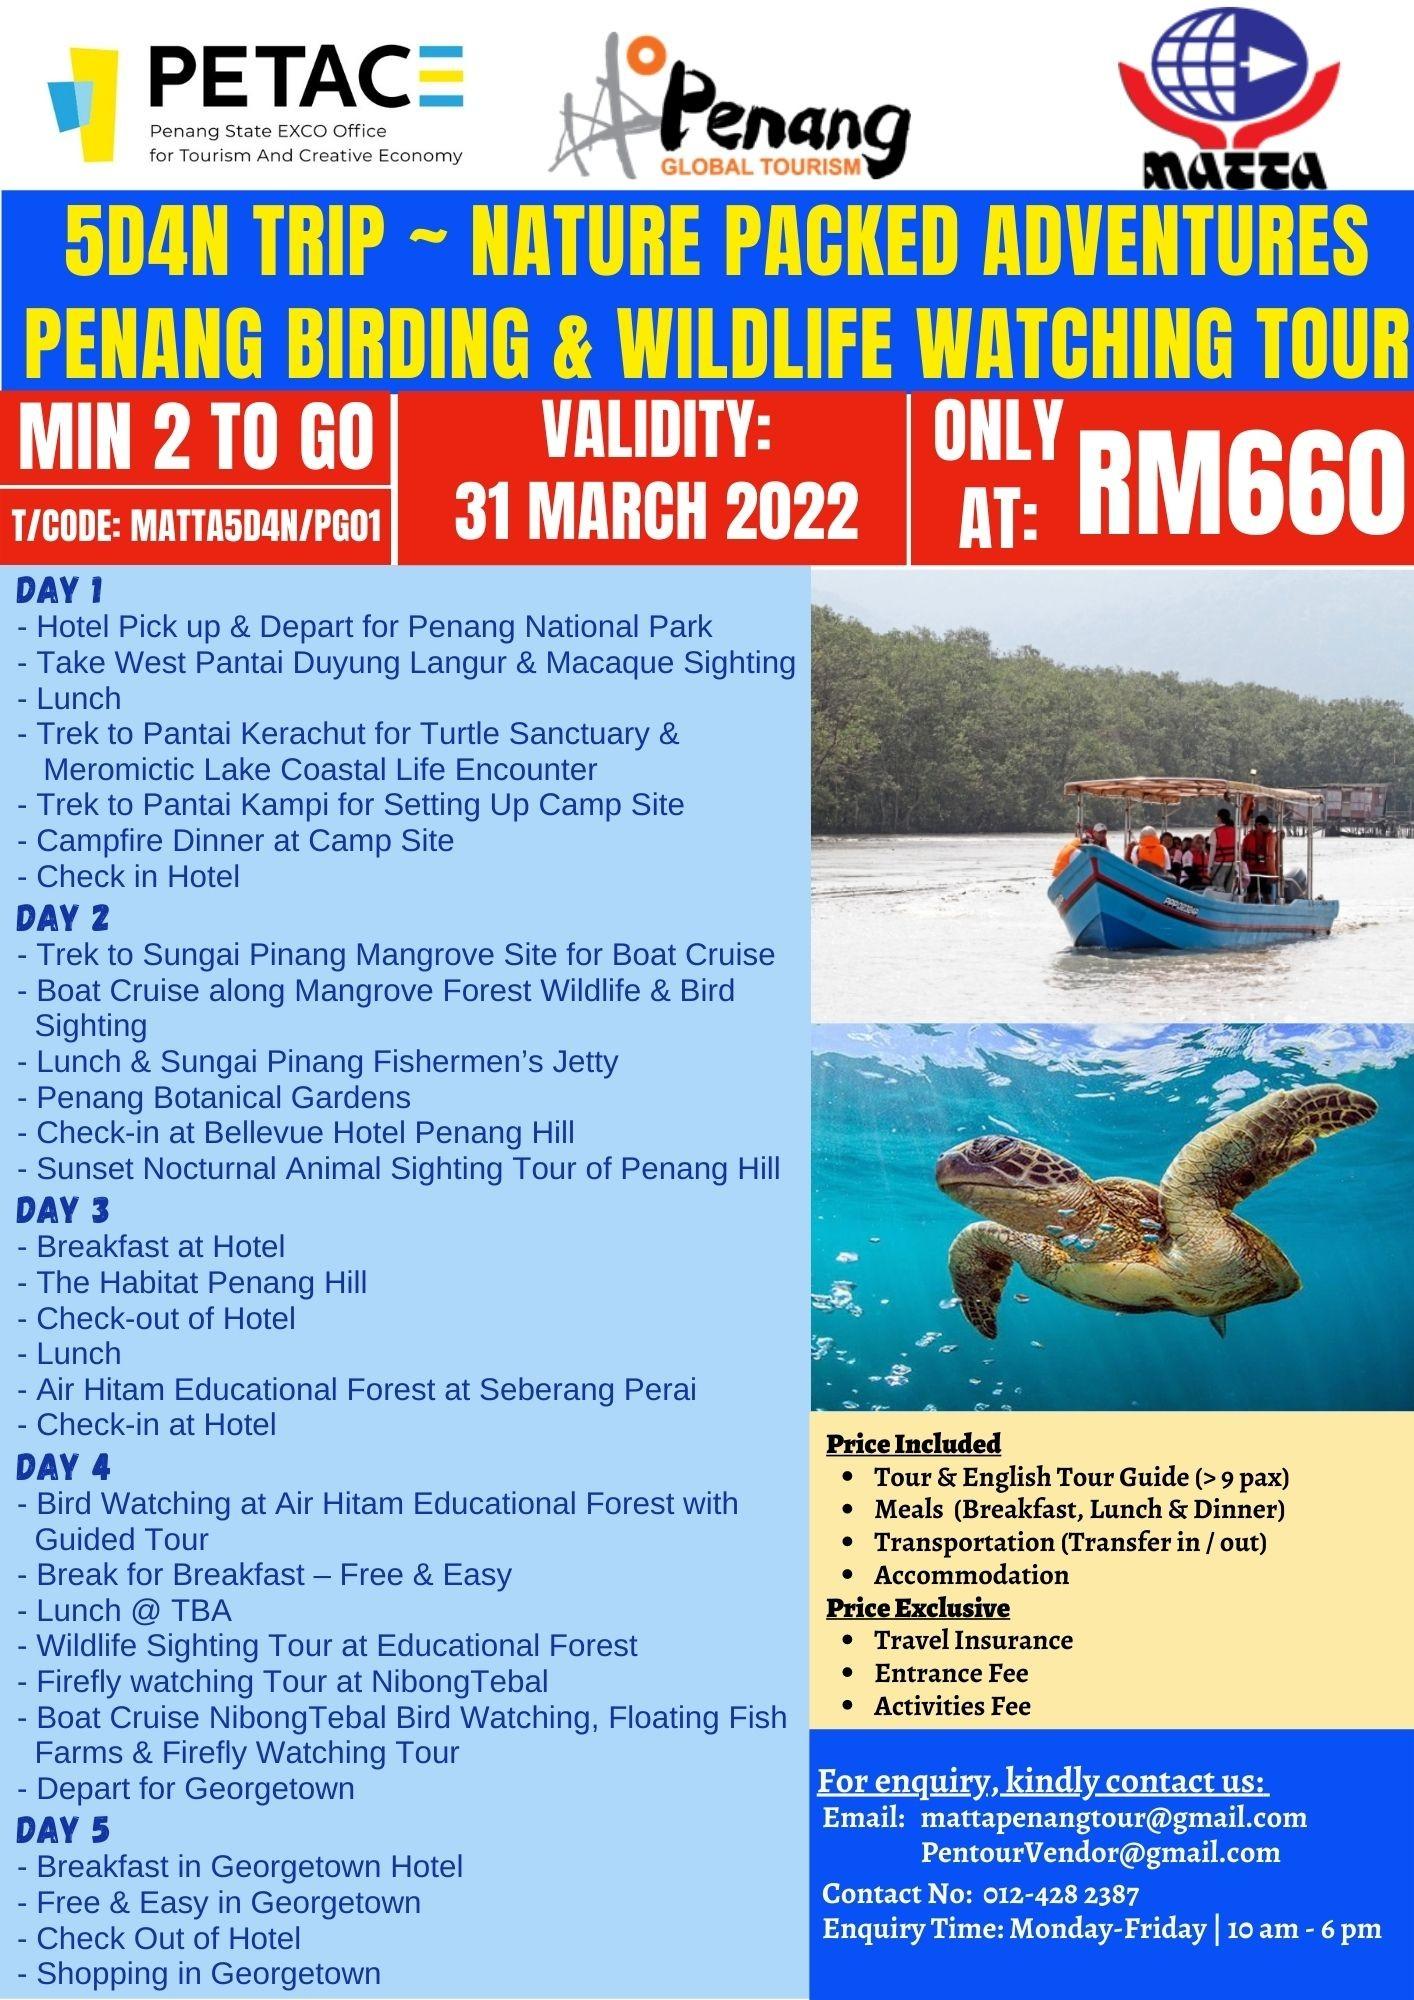 5D4N Trip ~ Nature Packed Adventures Penang Birding & Wildlife Watching Tour